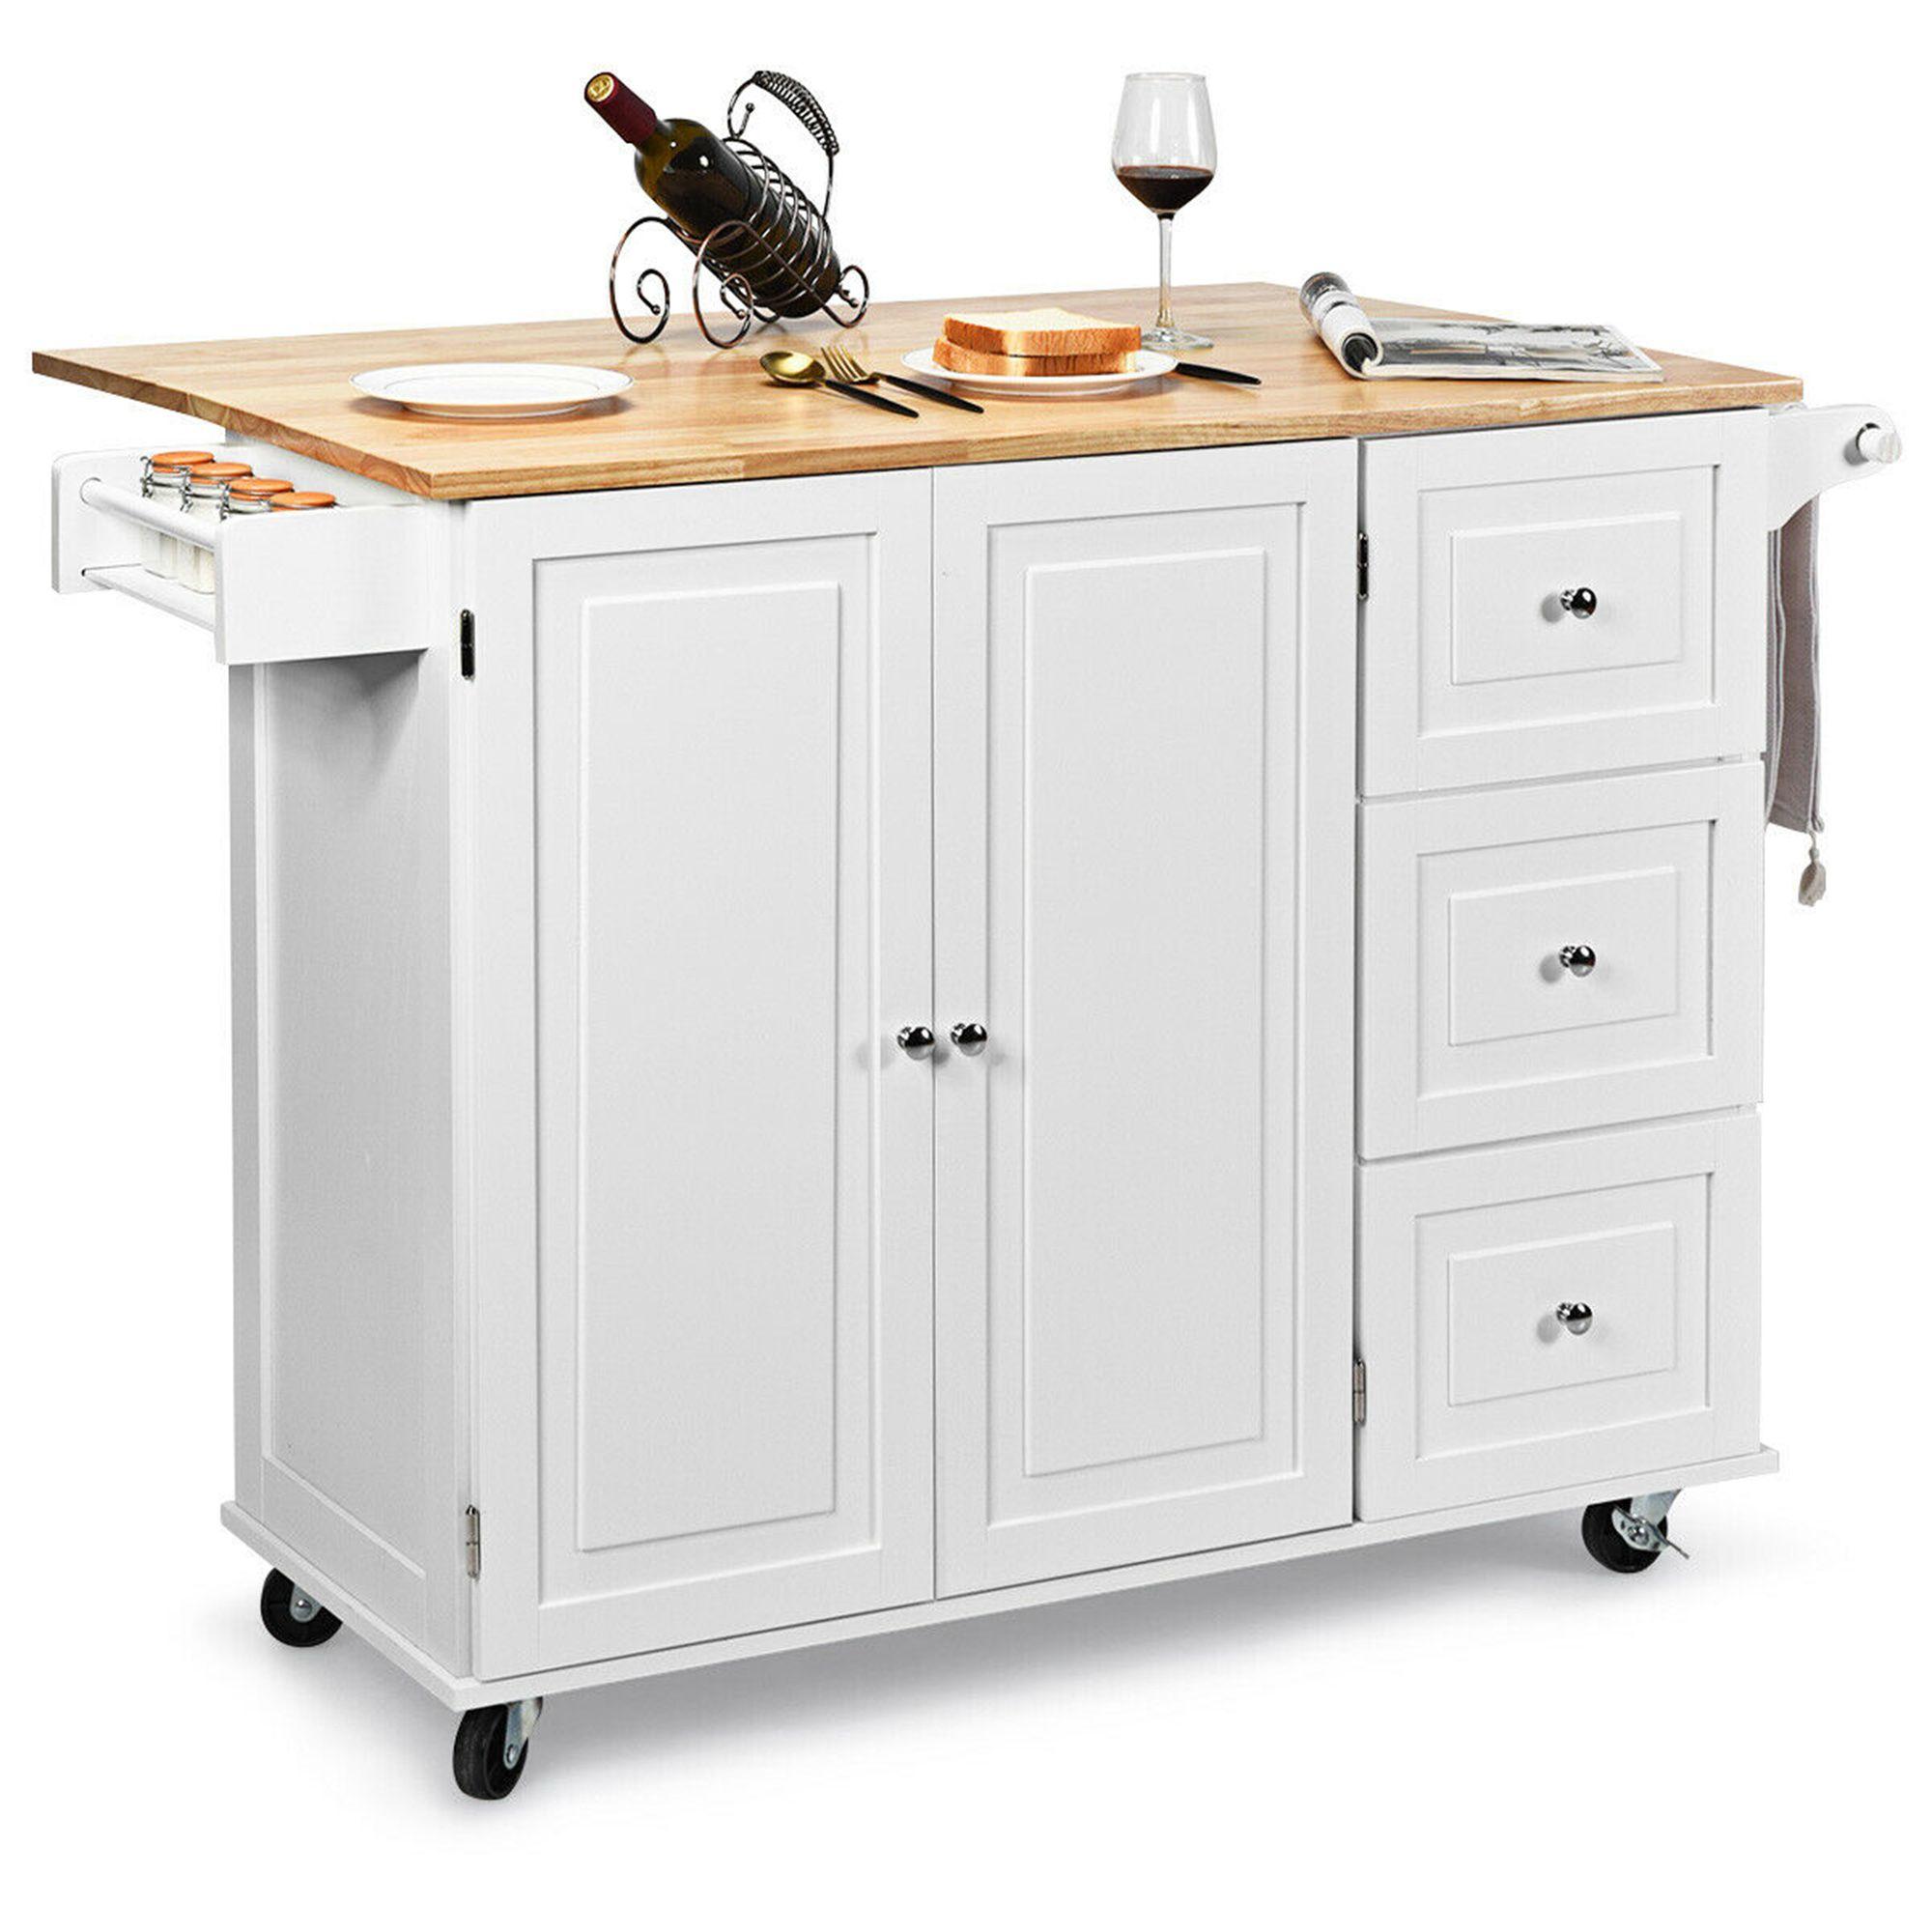 Free 2 Day Shipping Buy Hodedah Modern Kitchen Cabinet White At Walmart Com In 2020 Modern Kitchen Cabinets Modern White Kitchen Cabinets Modern Kitchen